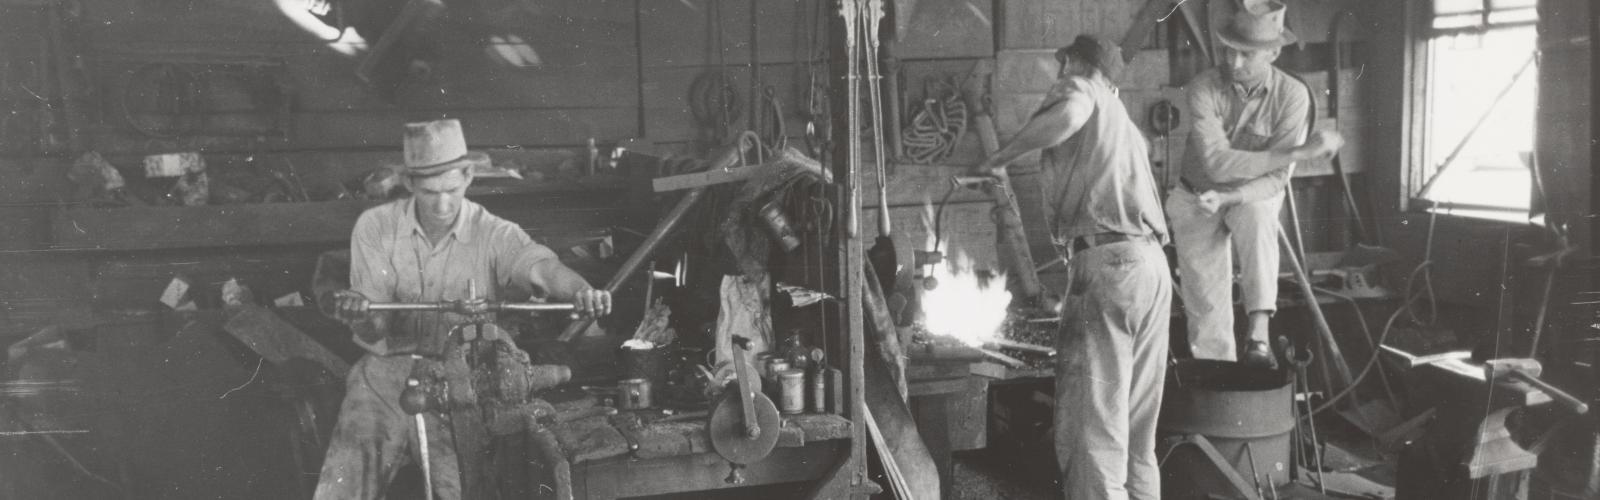 fabrieksarbeiders